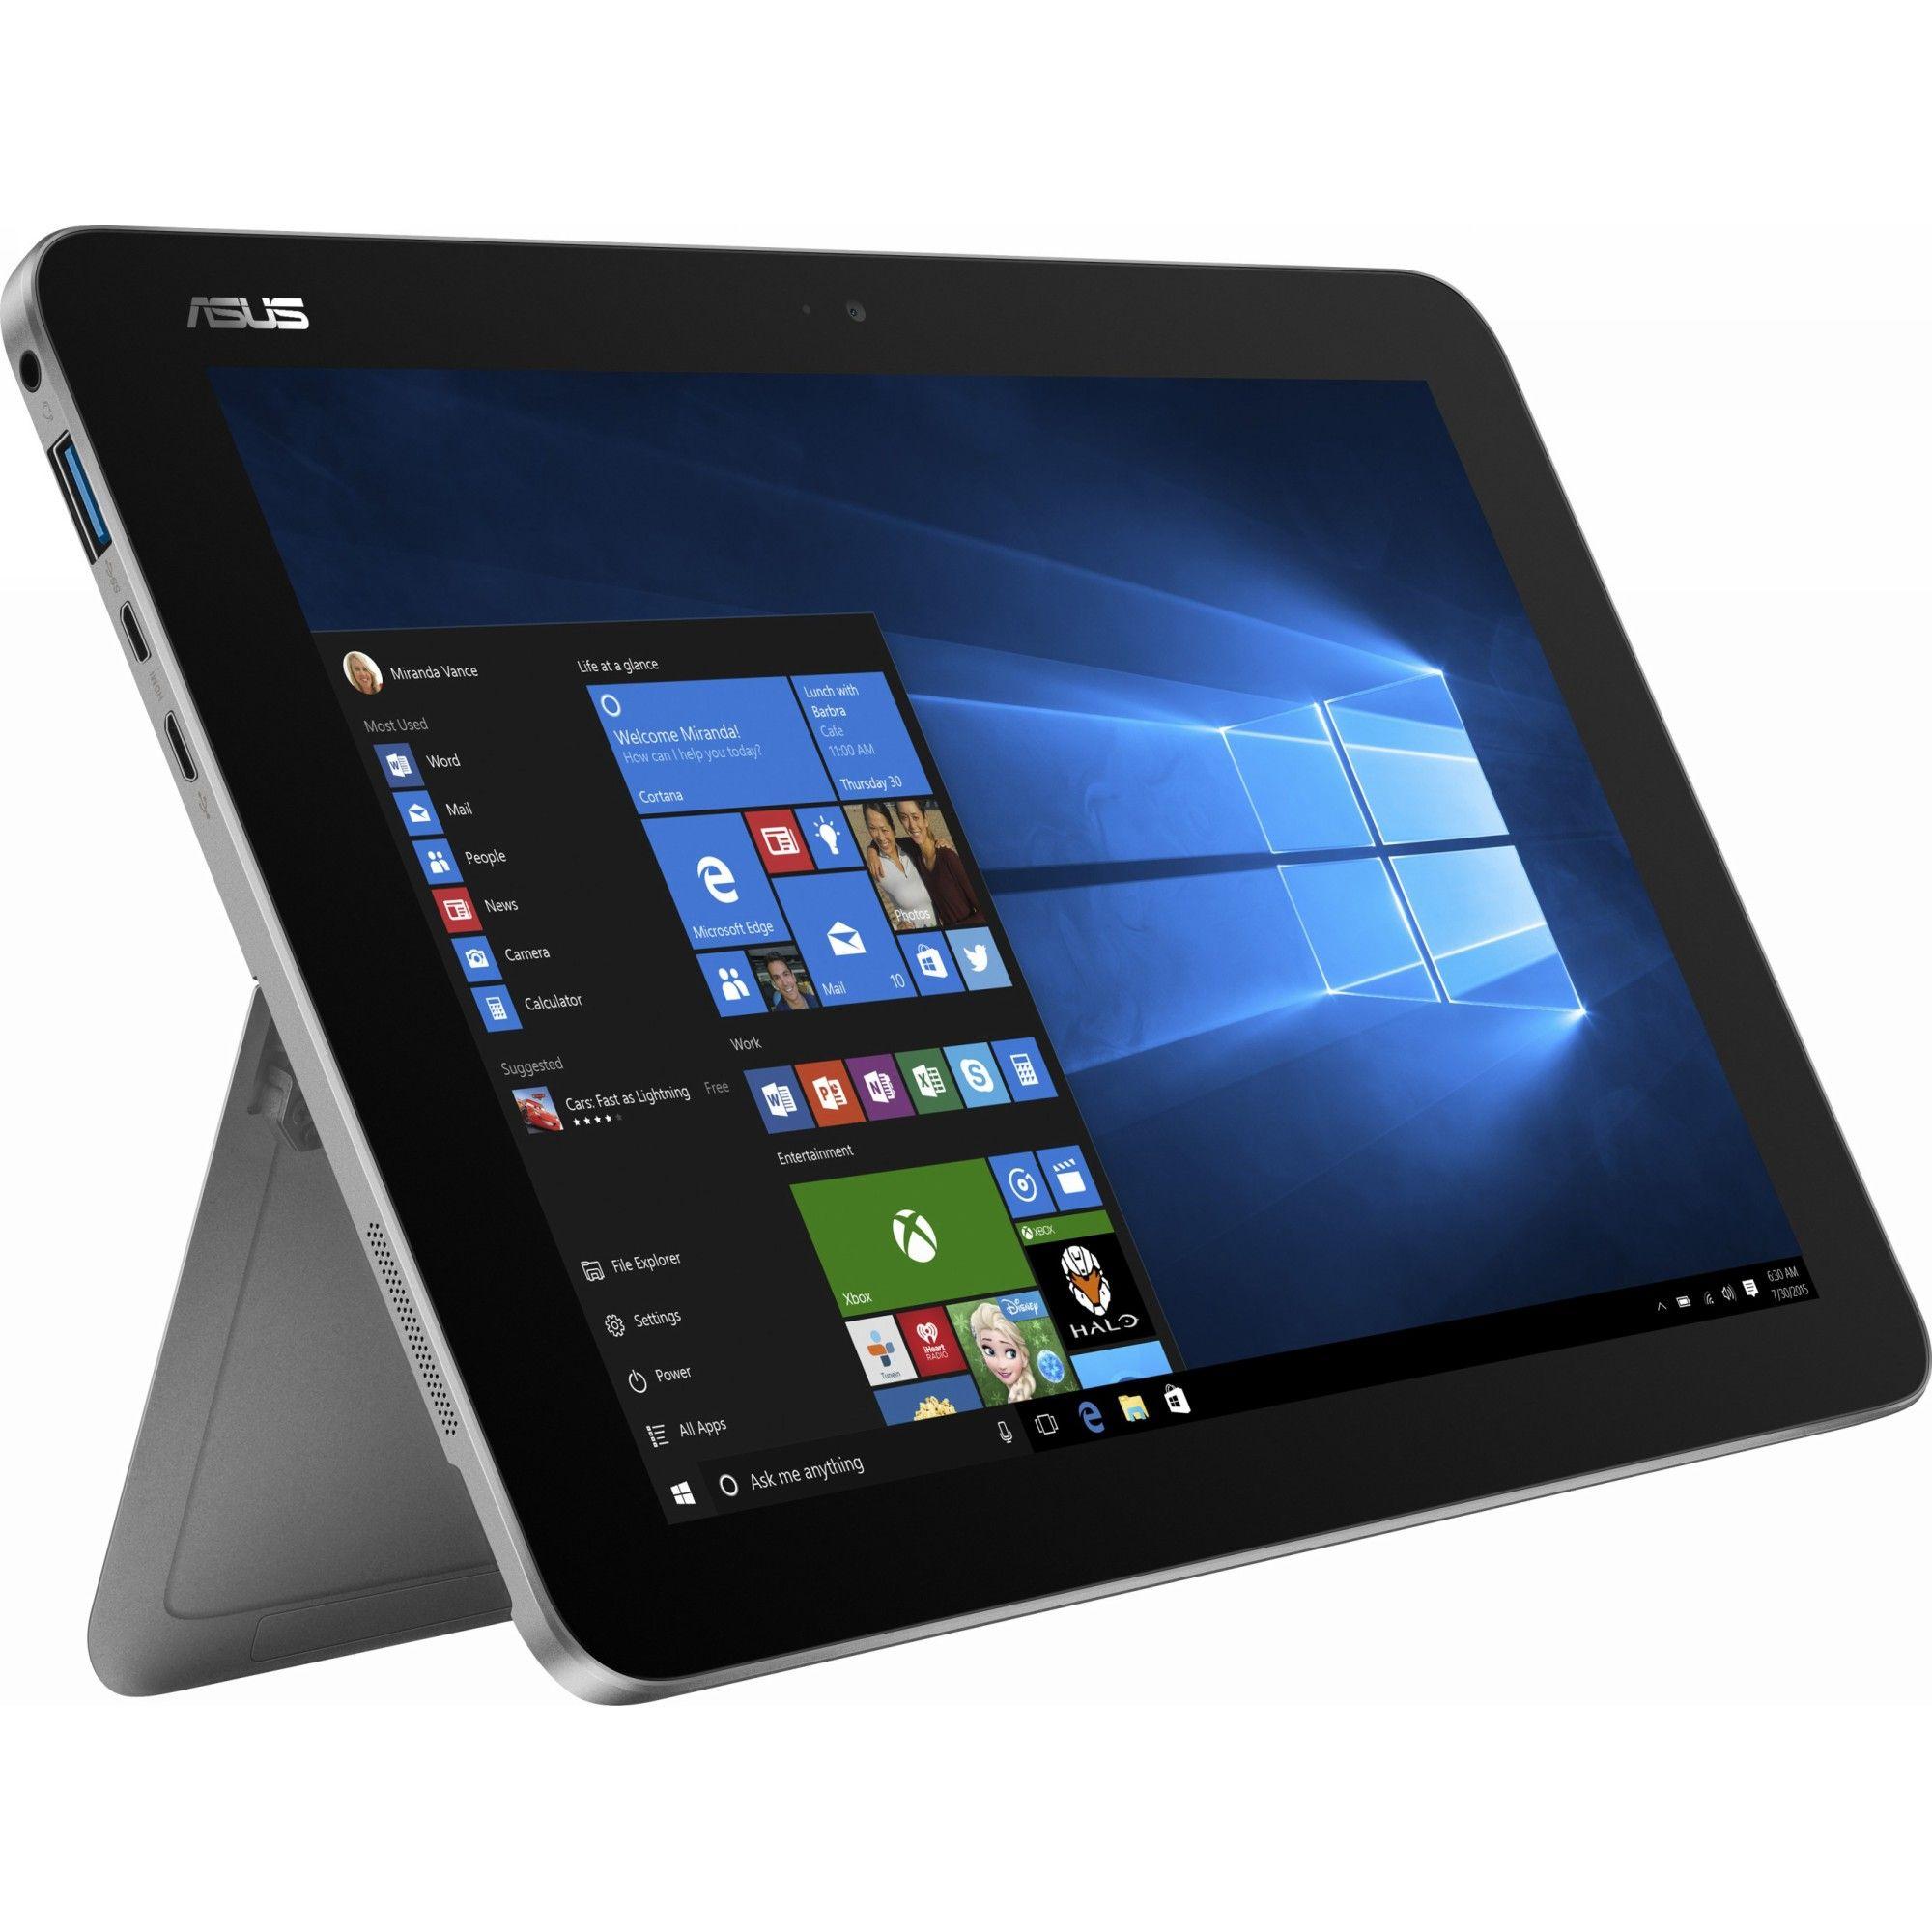 Tableta Asus Transformer Mini T102HA 10.1 64GB Flash 4GB RAM Windows 10 Home Grey